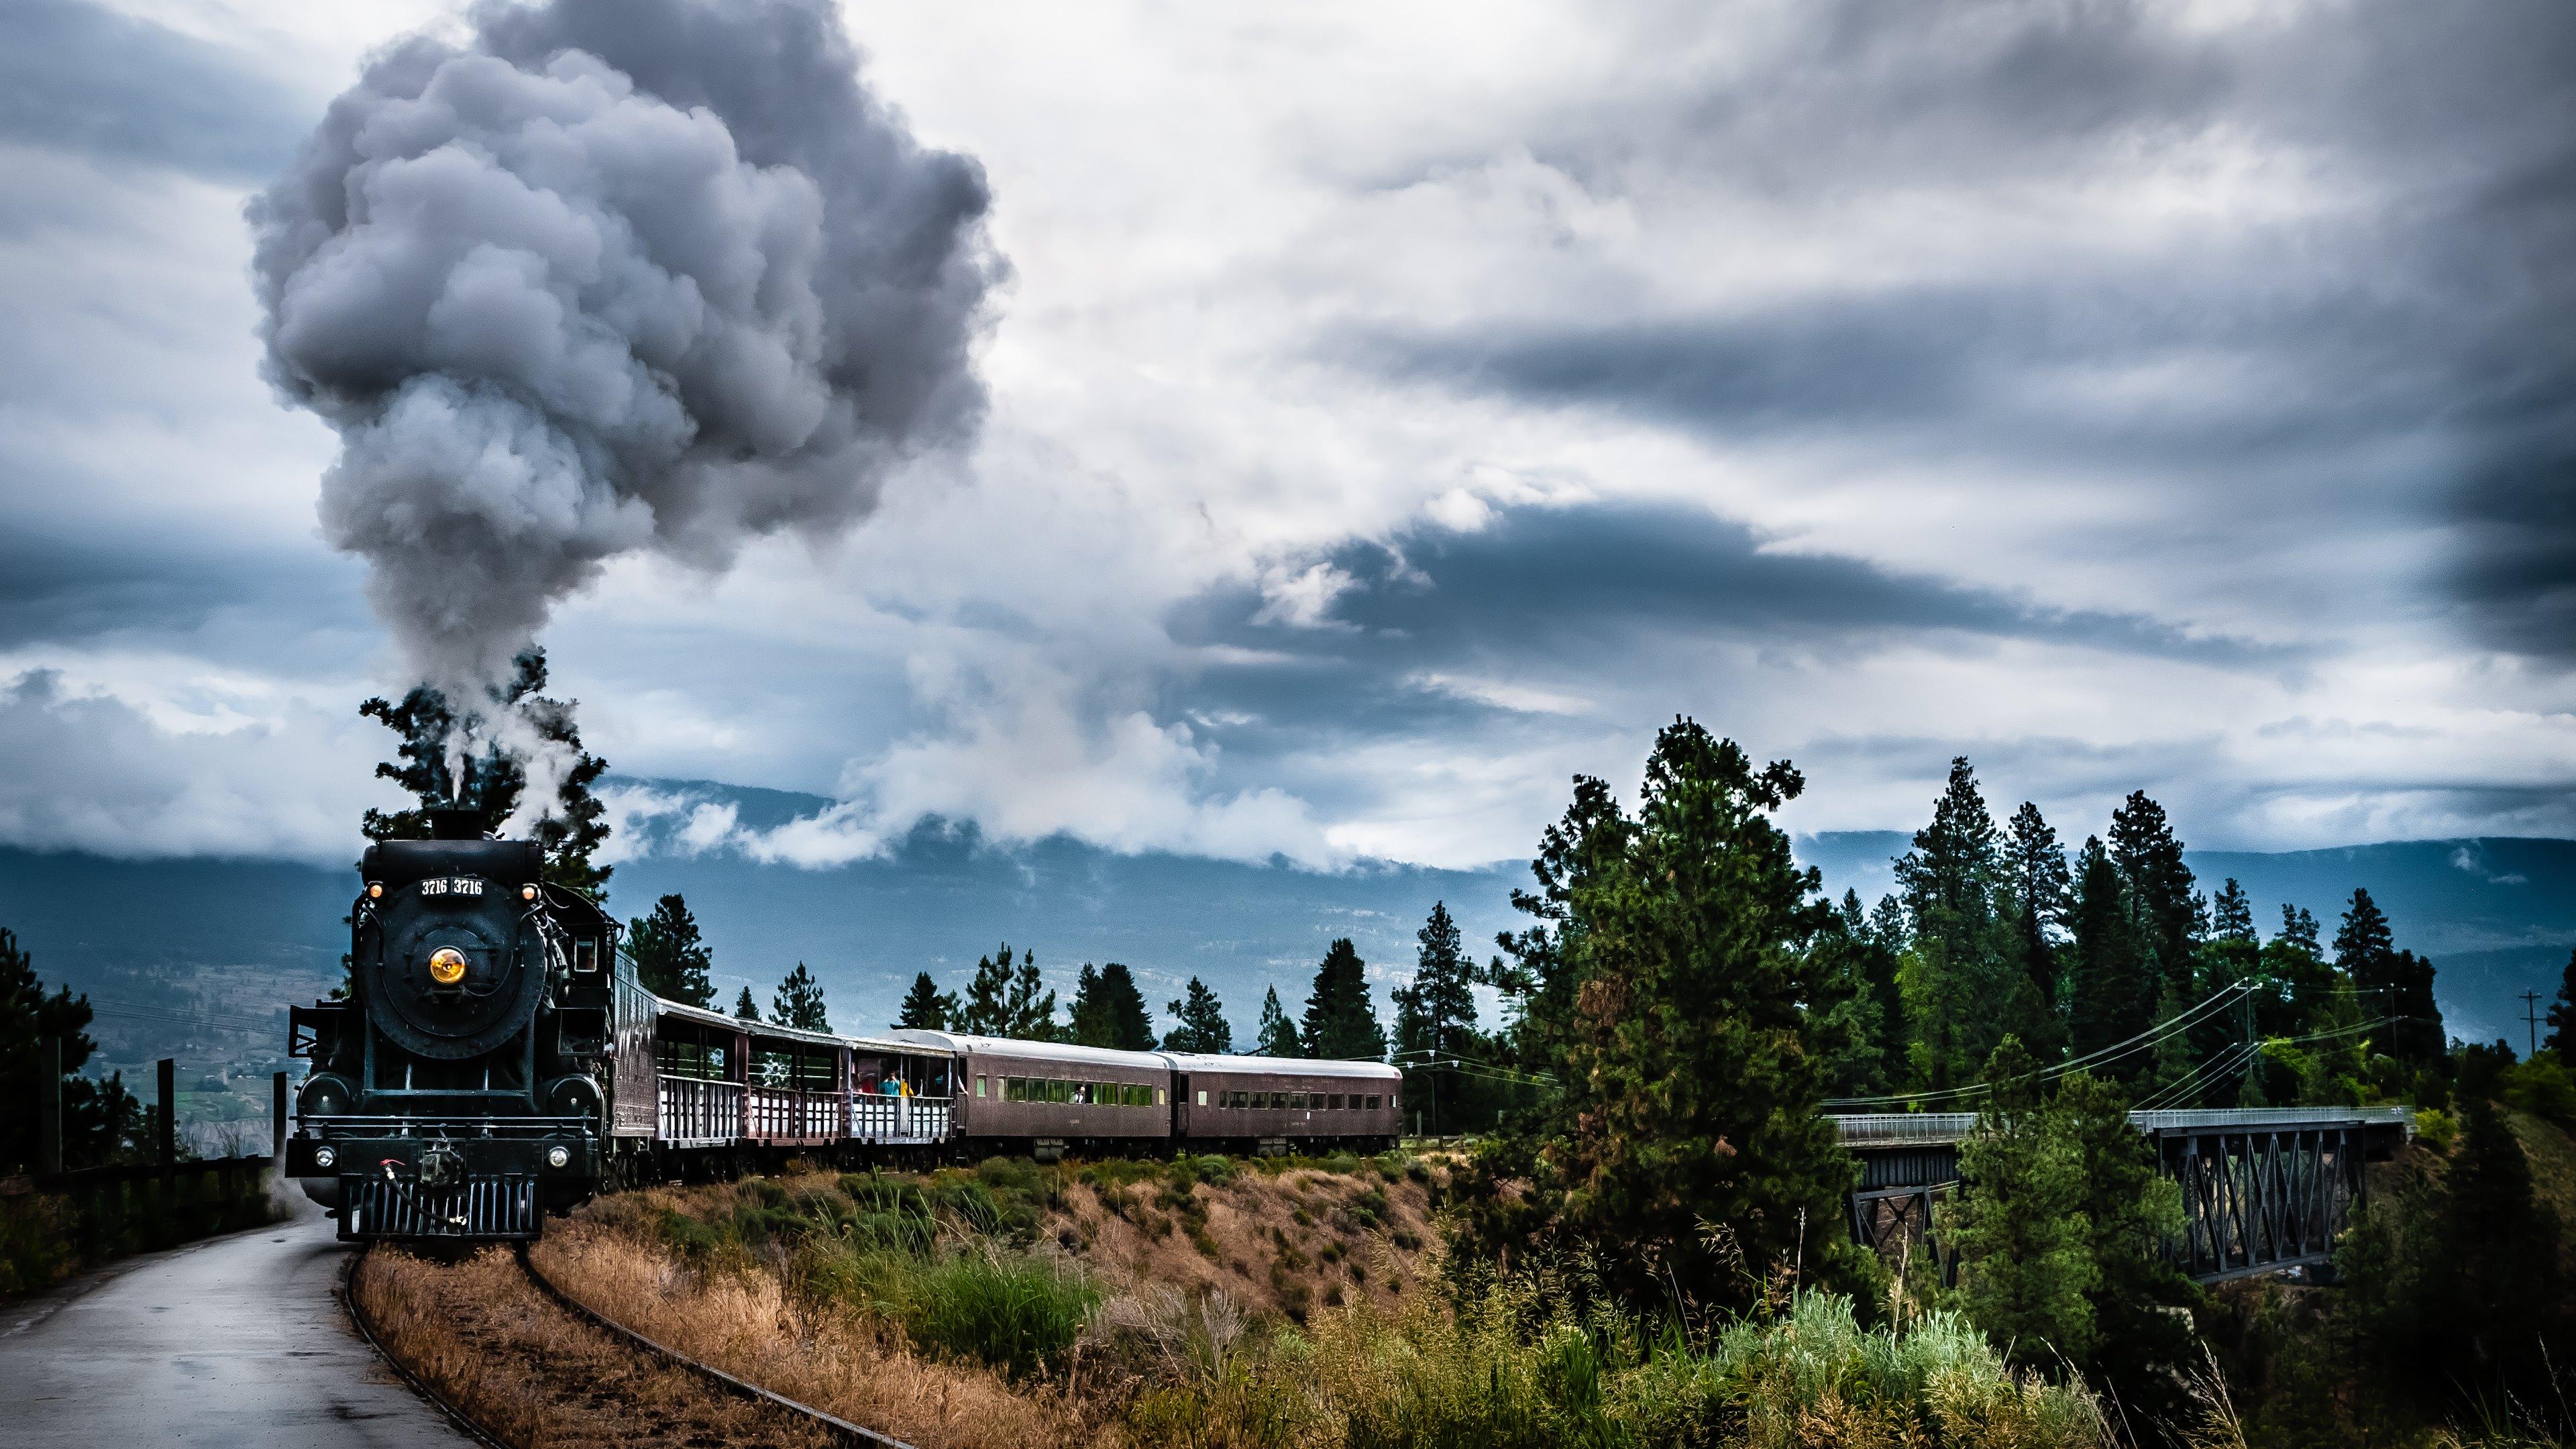 kettle valley steam train hd wallpapers 4k